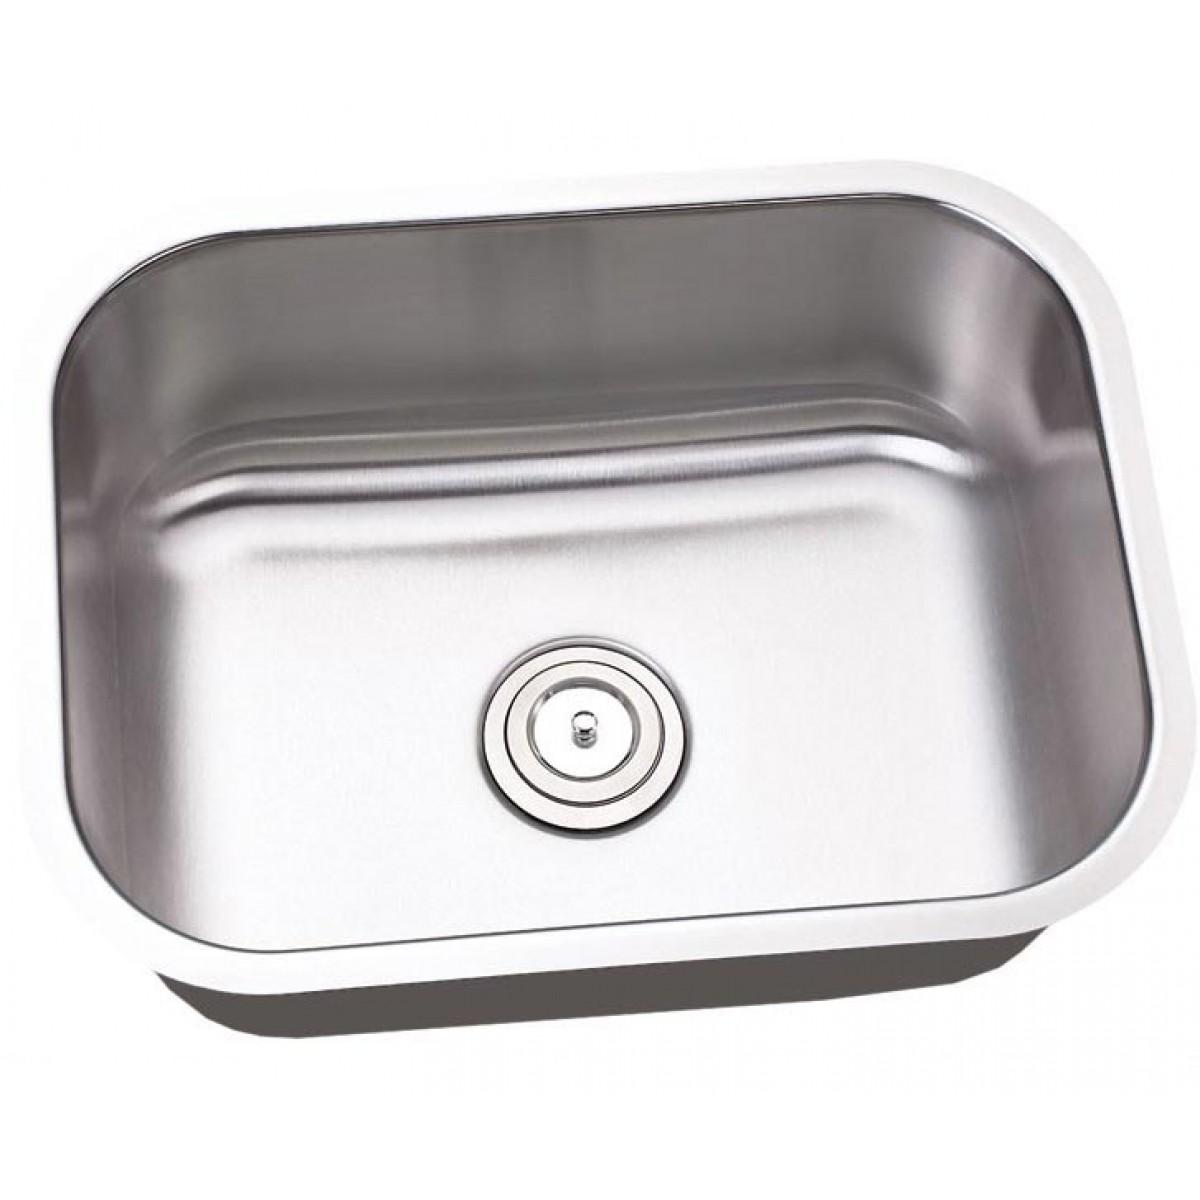 Kitchen Island With Sink Dimensions: 23 Inch Stainless Steel Undermount Single Bowl Kitchen Island / Bar Sink